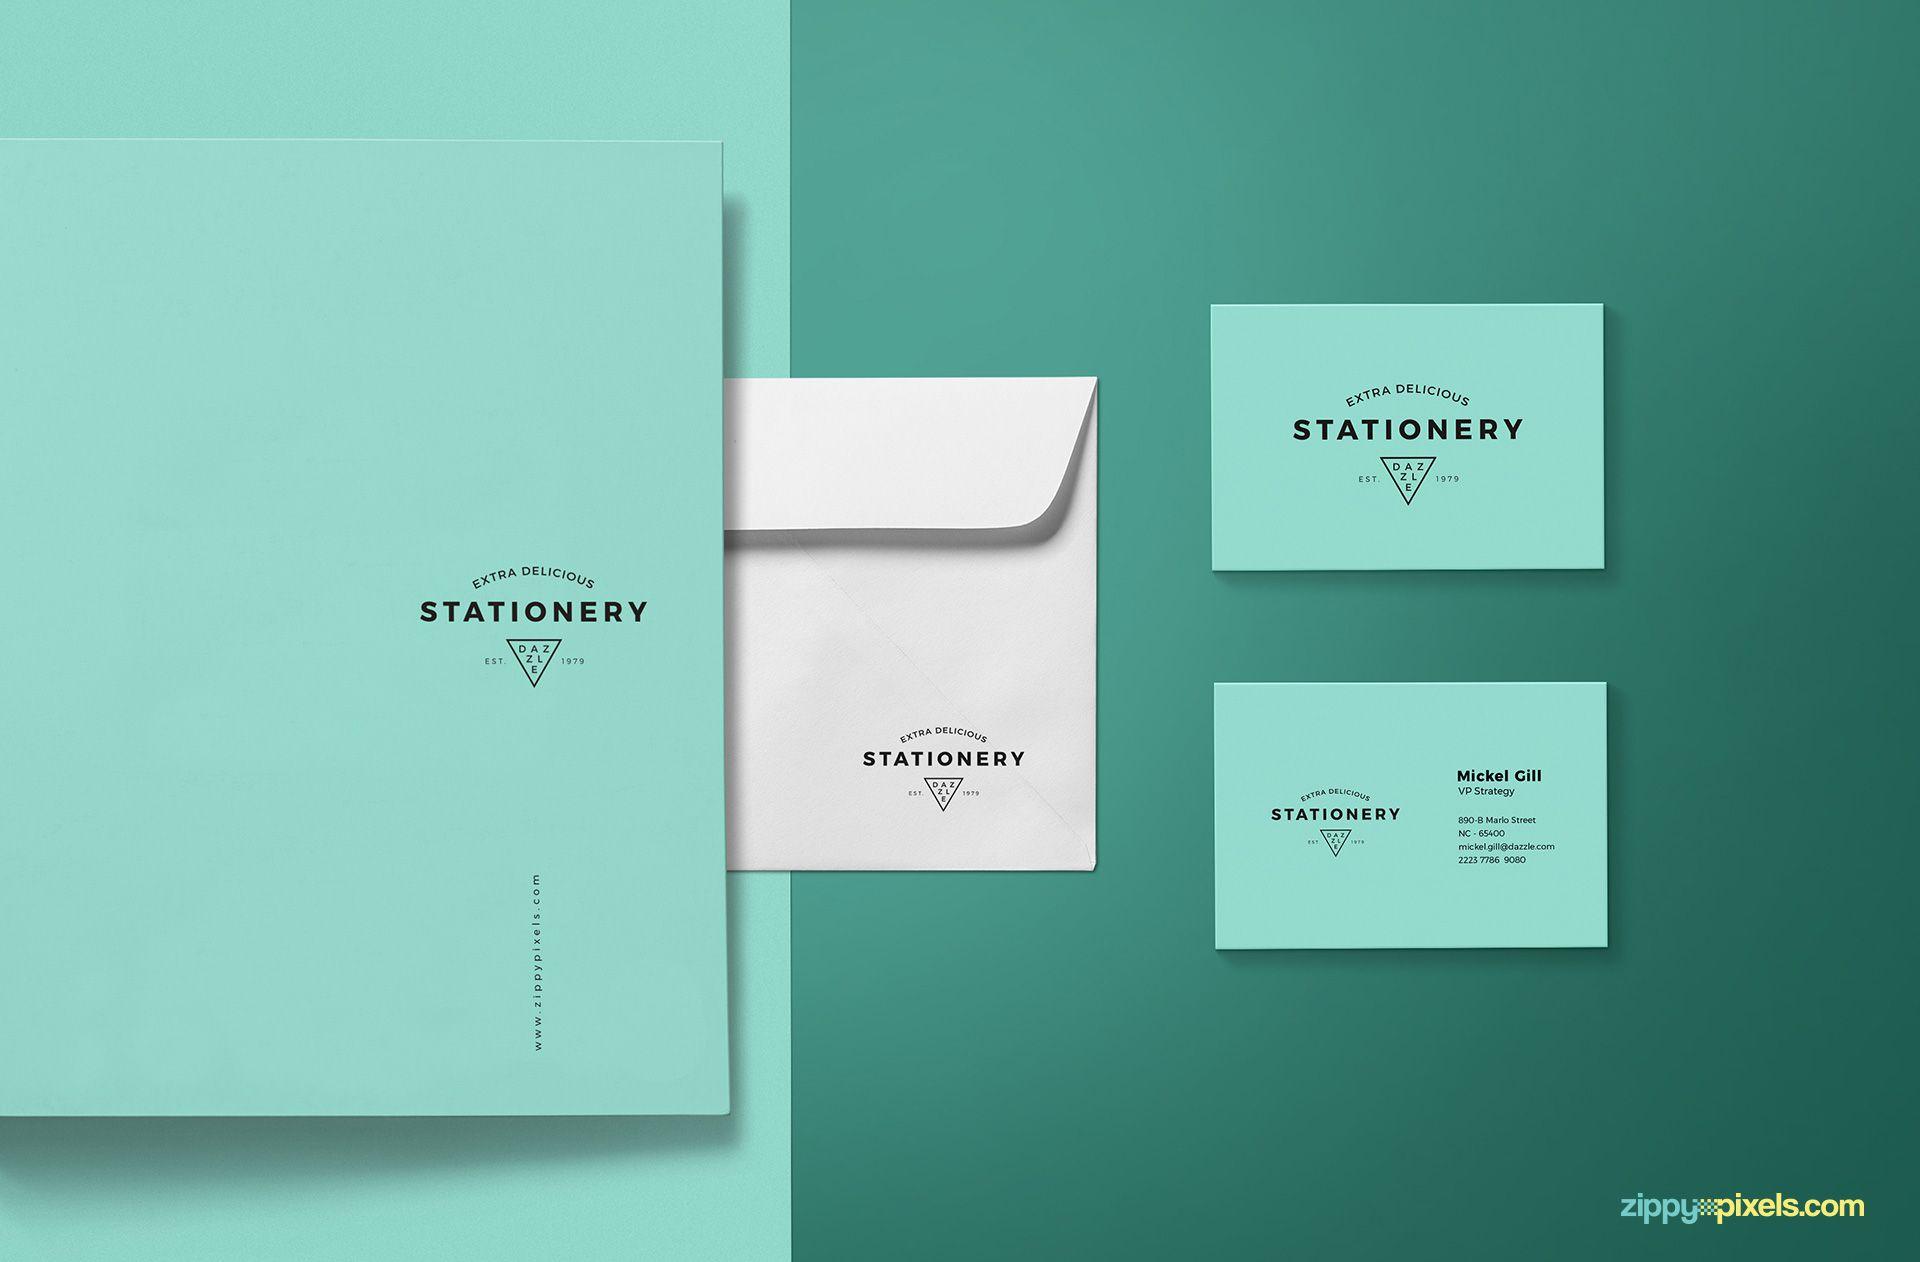 Best stationery branding mockup.